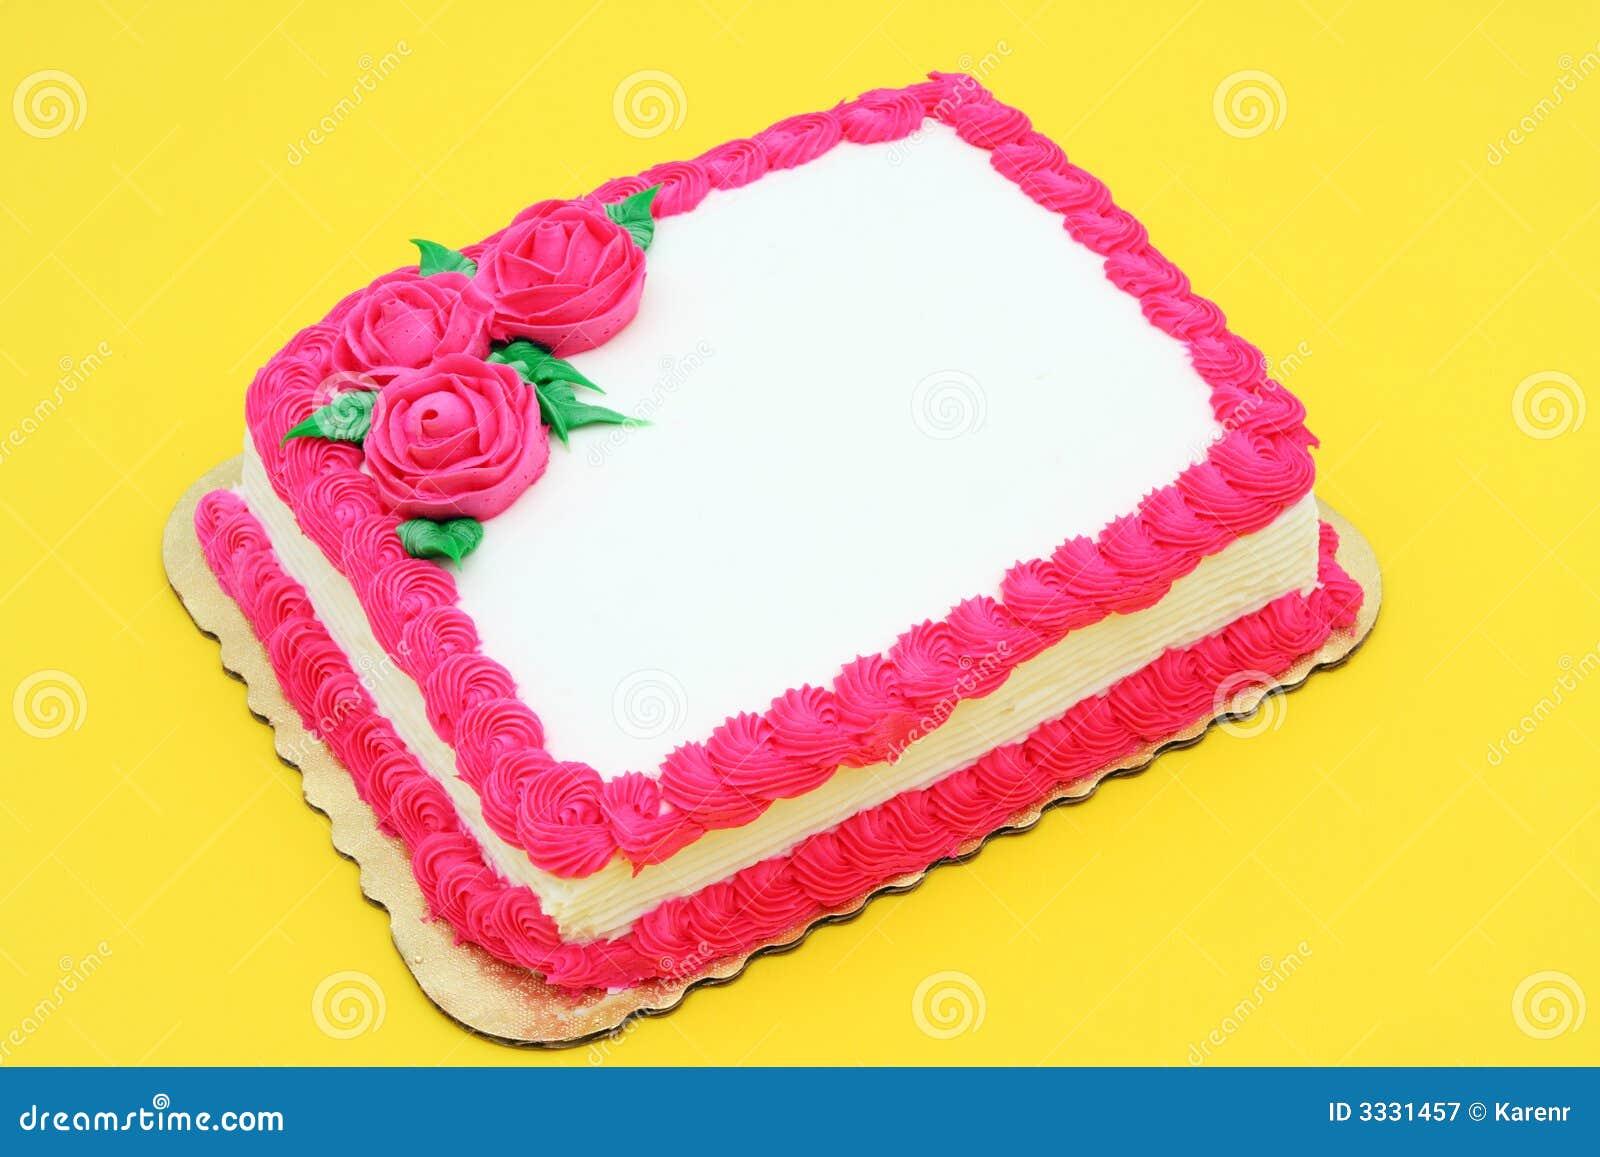 Blank Celebration Cake Royalty Free Stock Photography ...